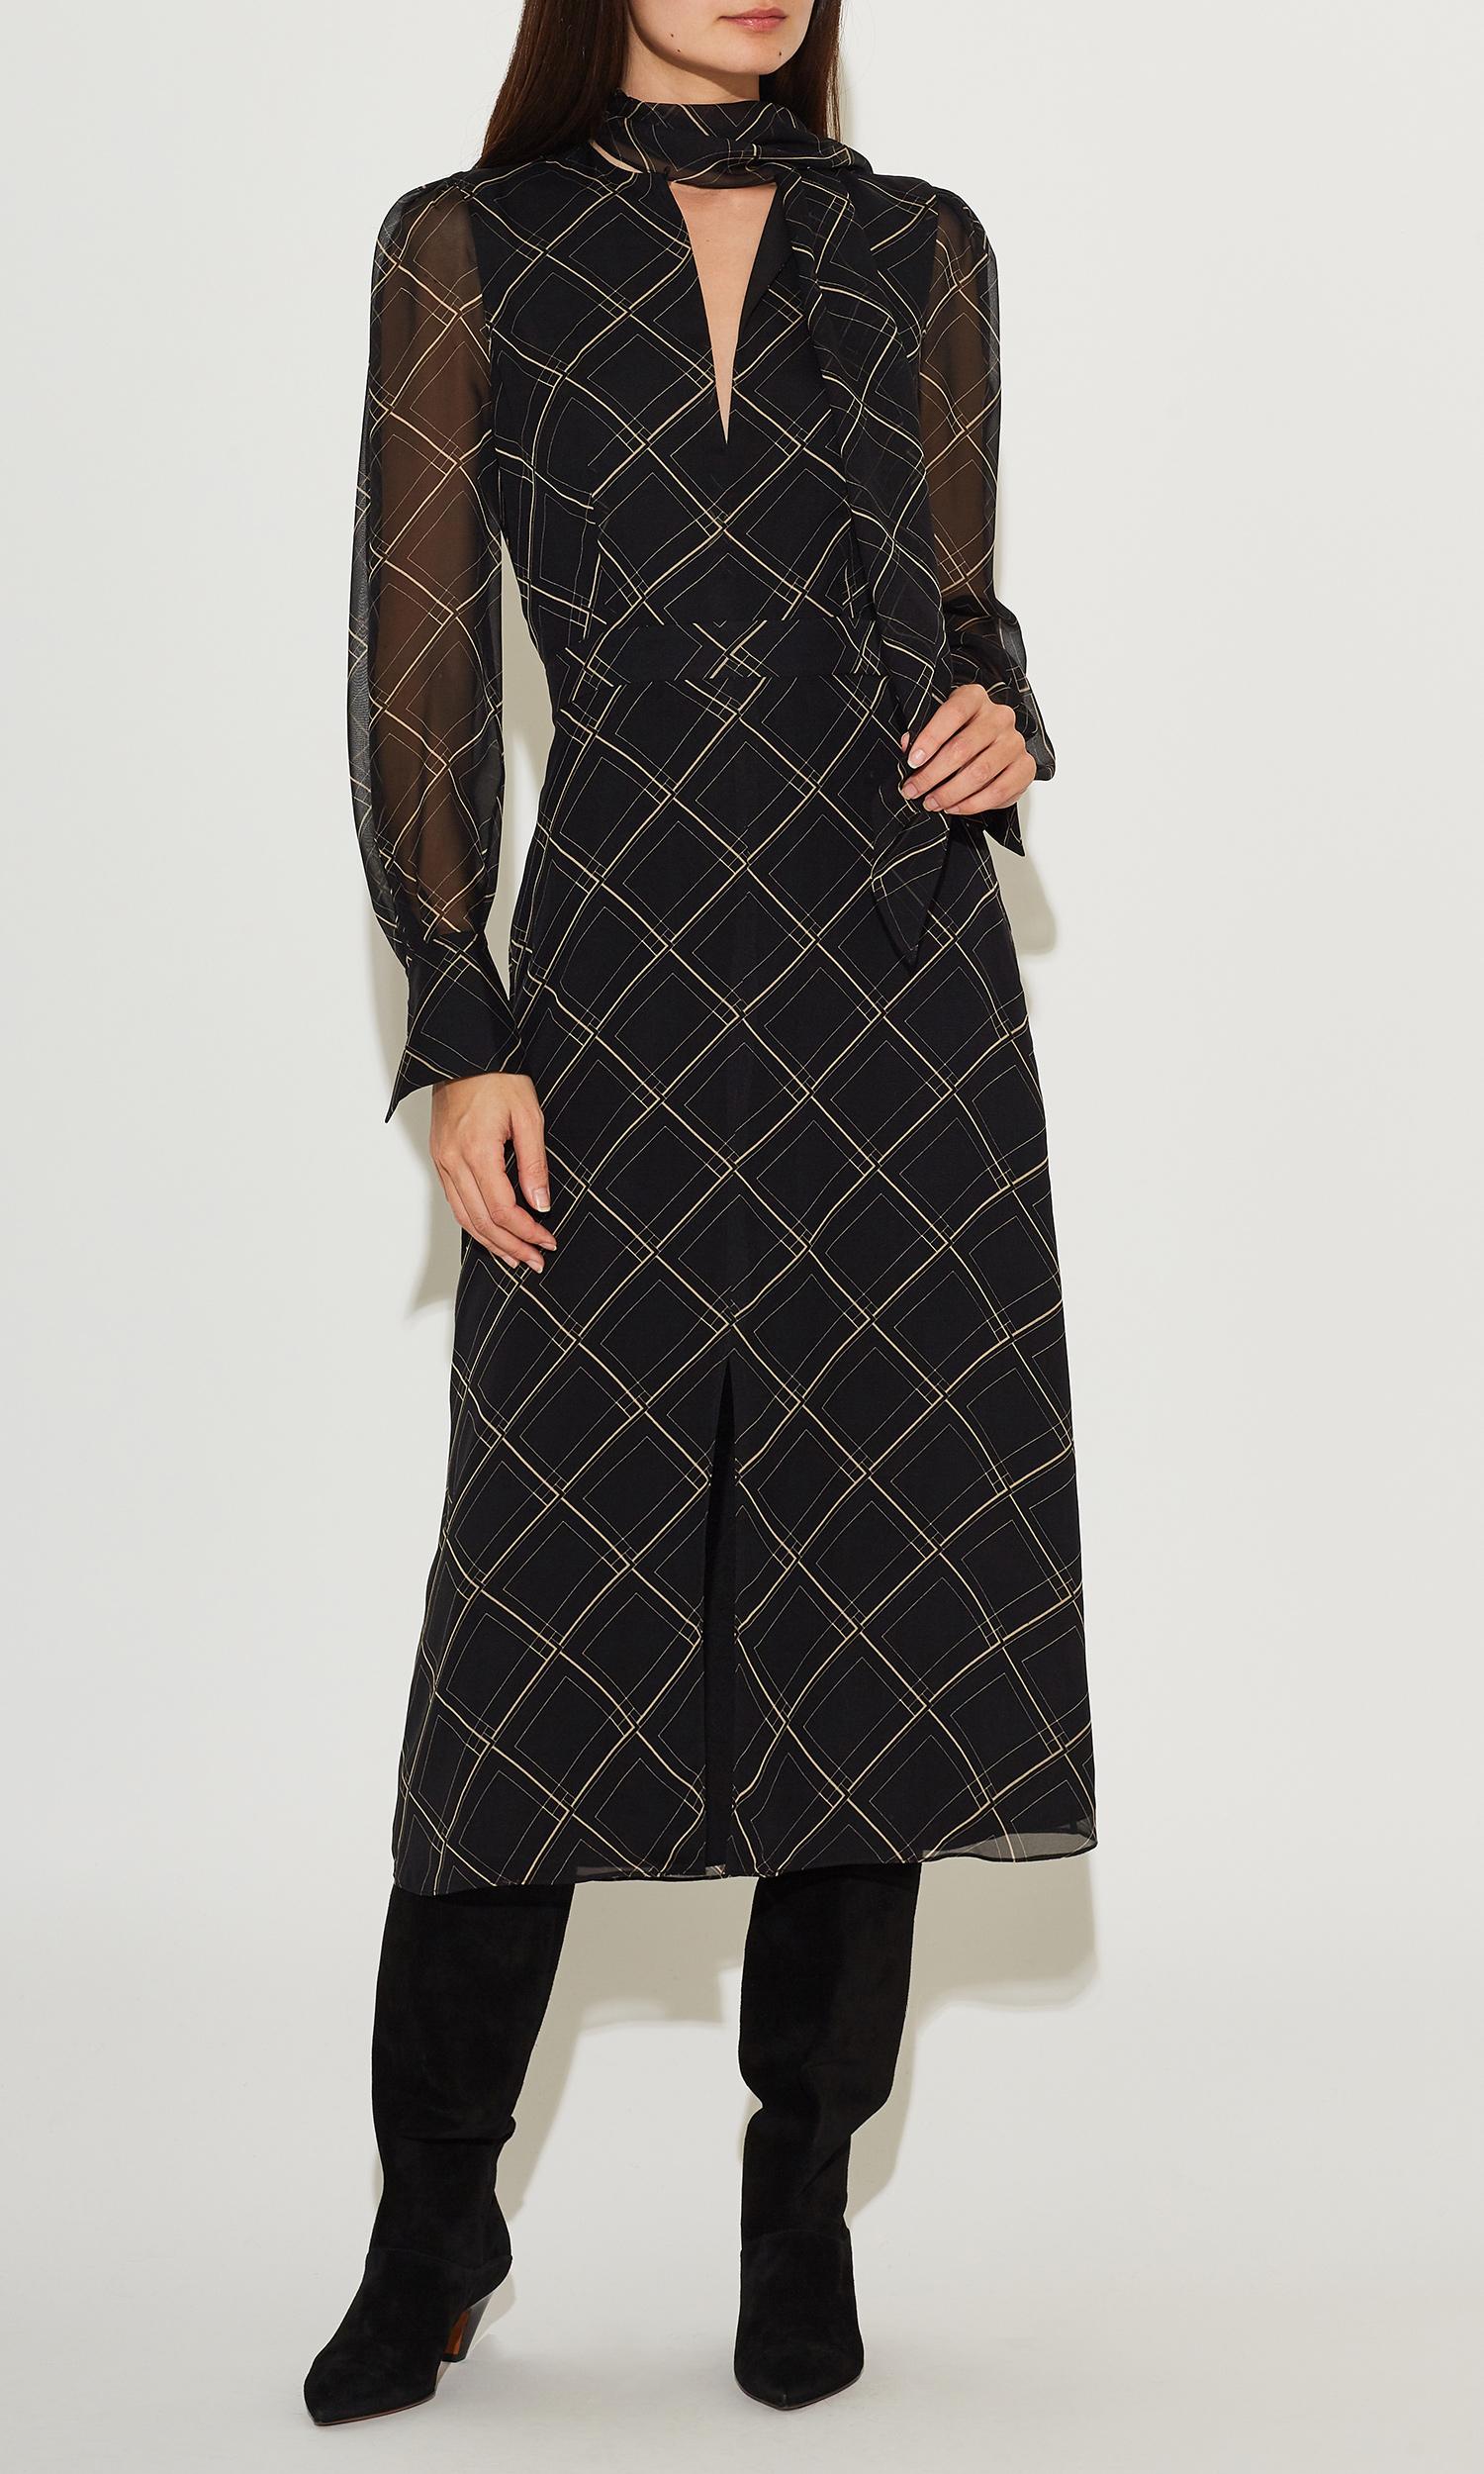 Calanne Silk Dress by Equipment